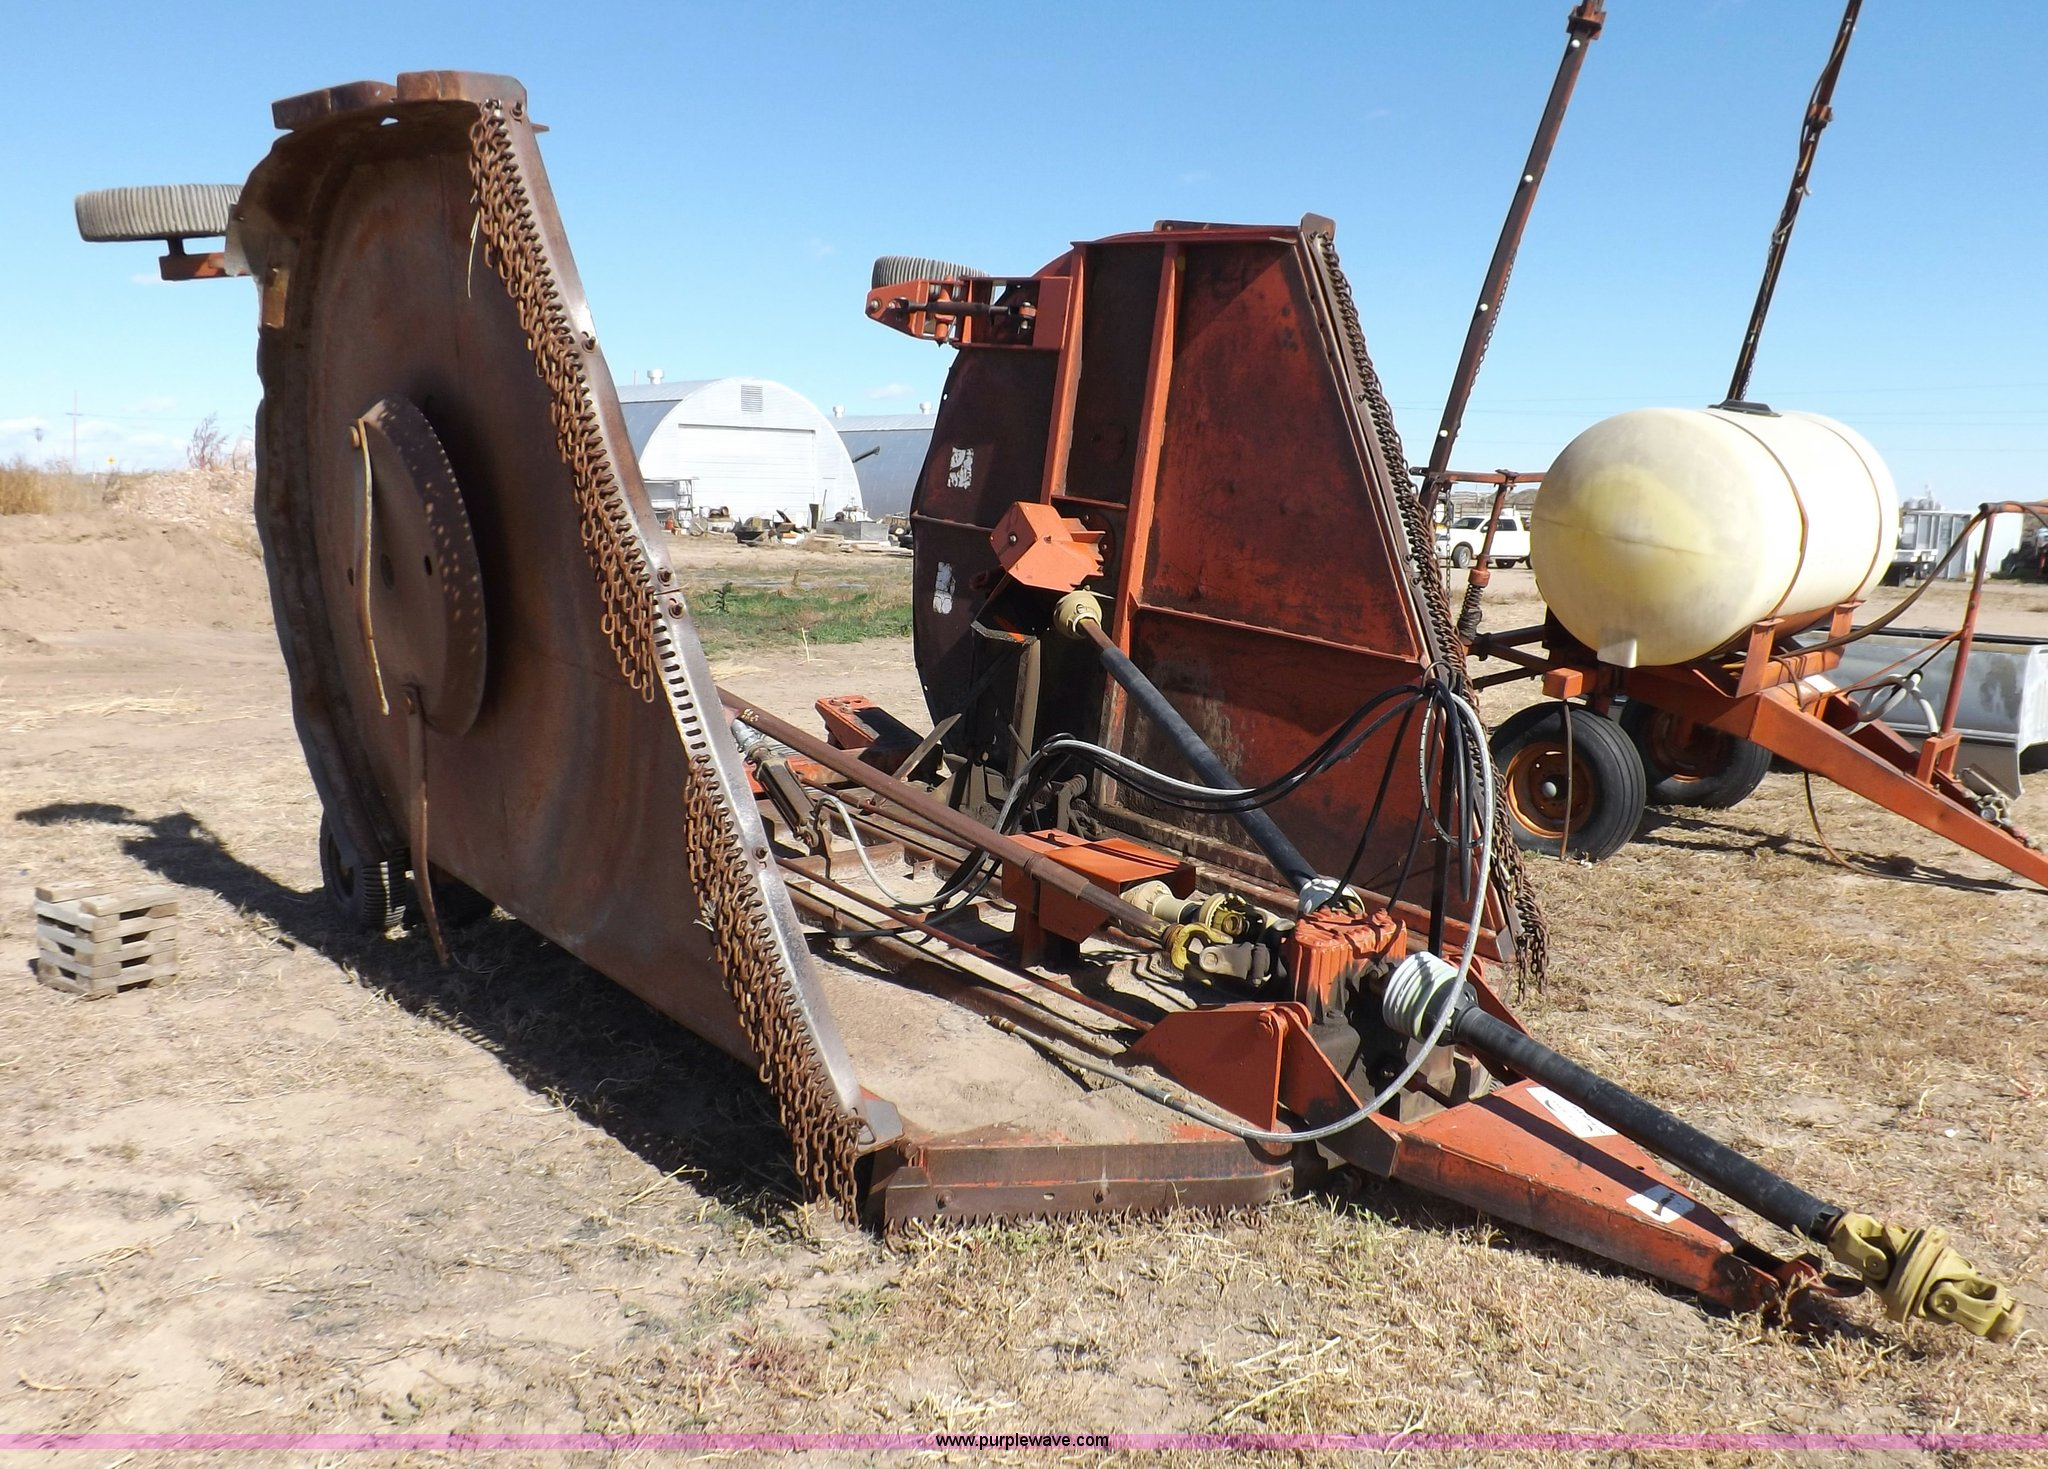 Rhino Flex 20 batwing mower | Item I8310 | SOLD! December 4